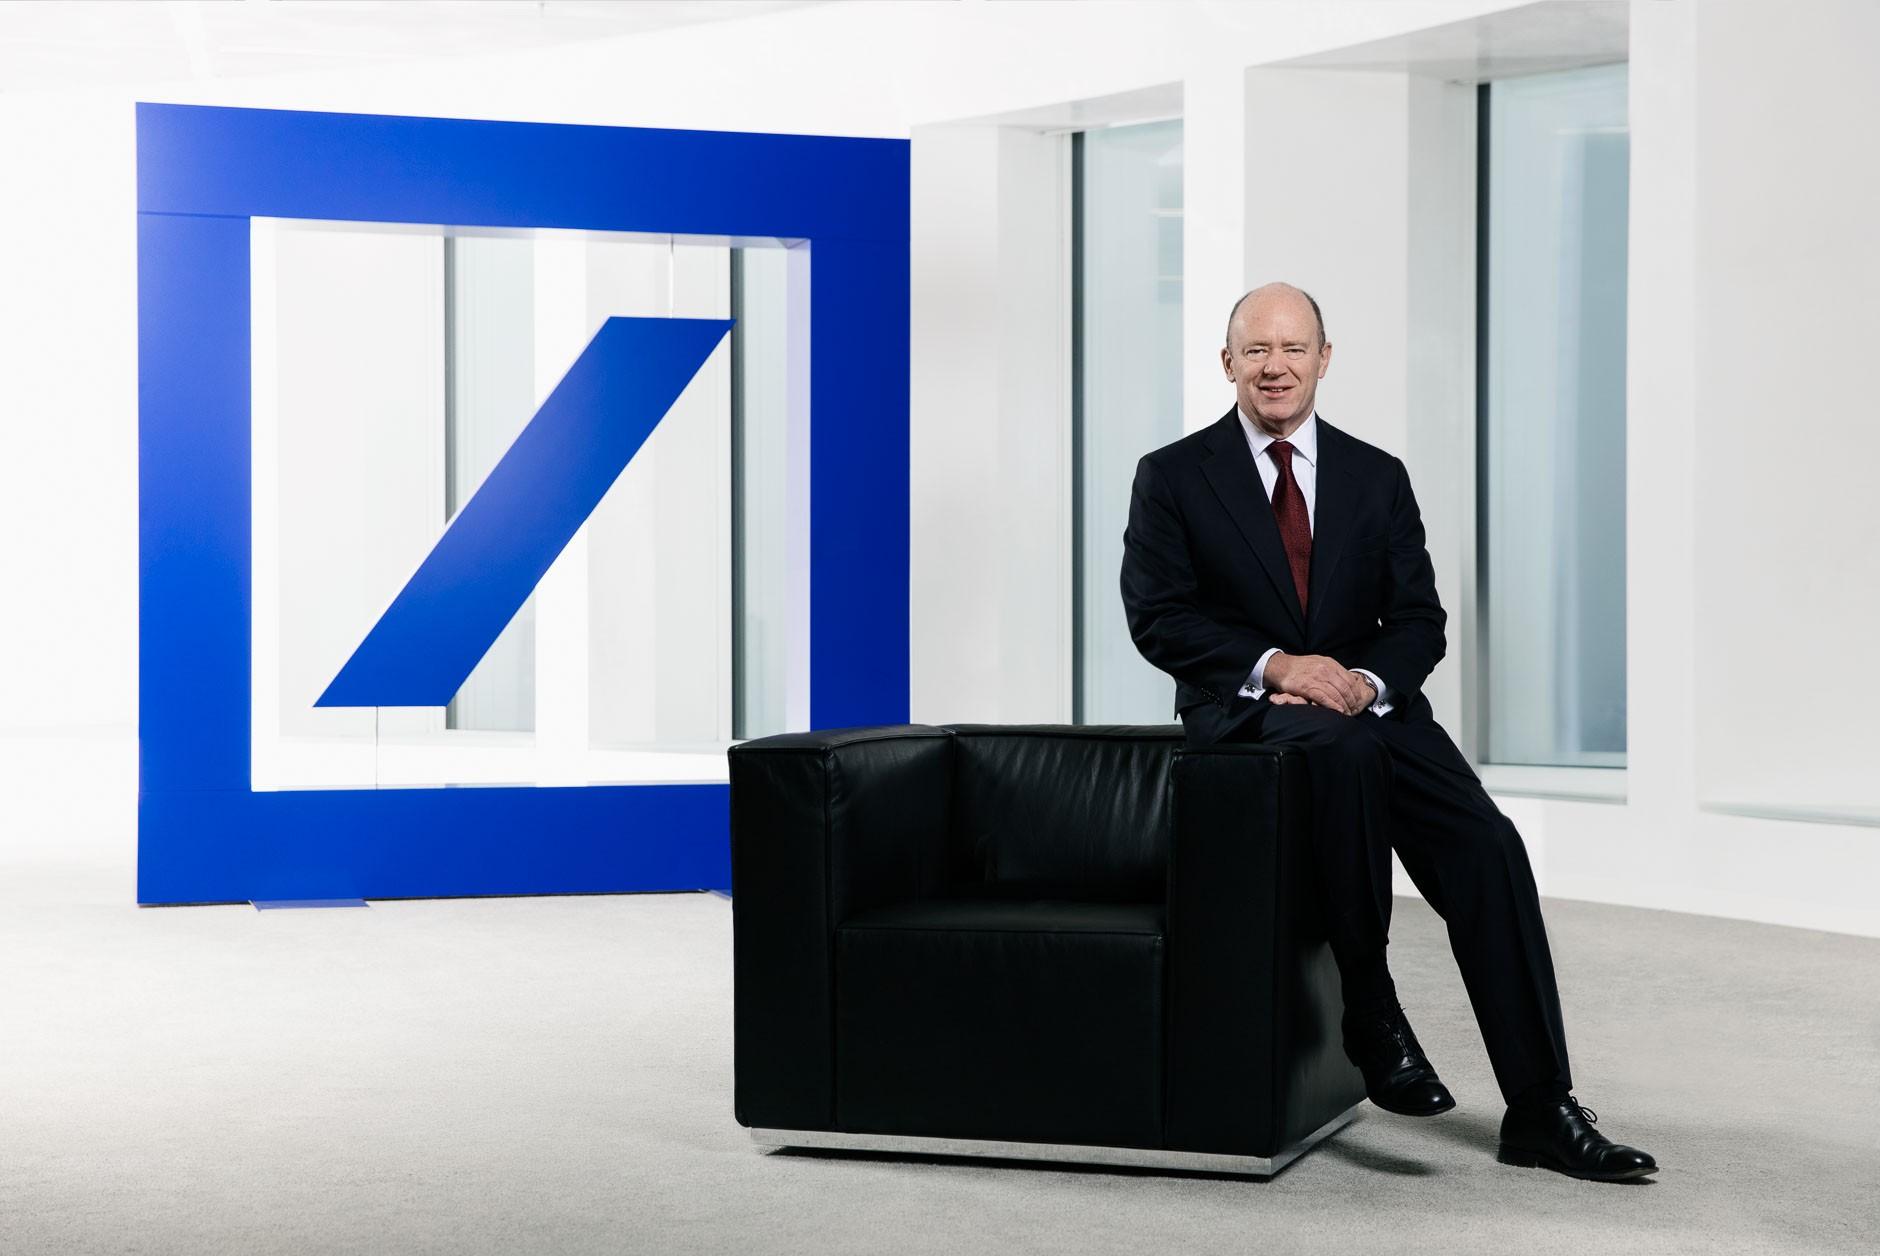 Businessporträt John Cryan, Vorstand Deutsche Bank AG, Frankfurt am Main